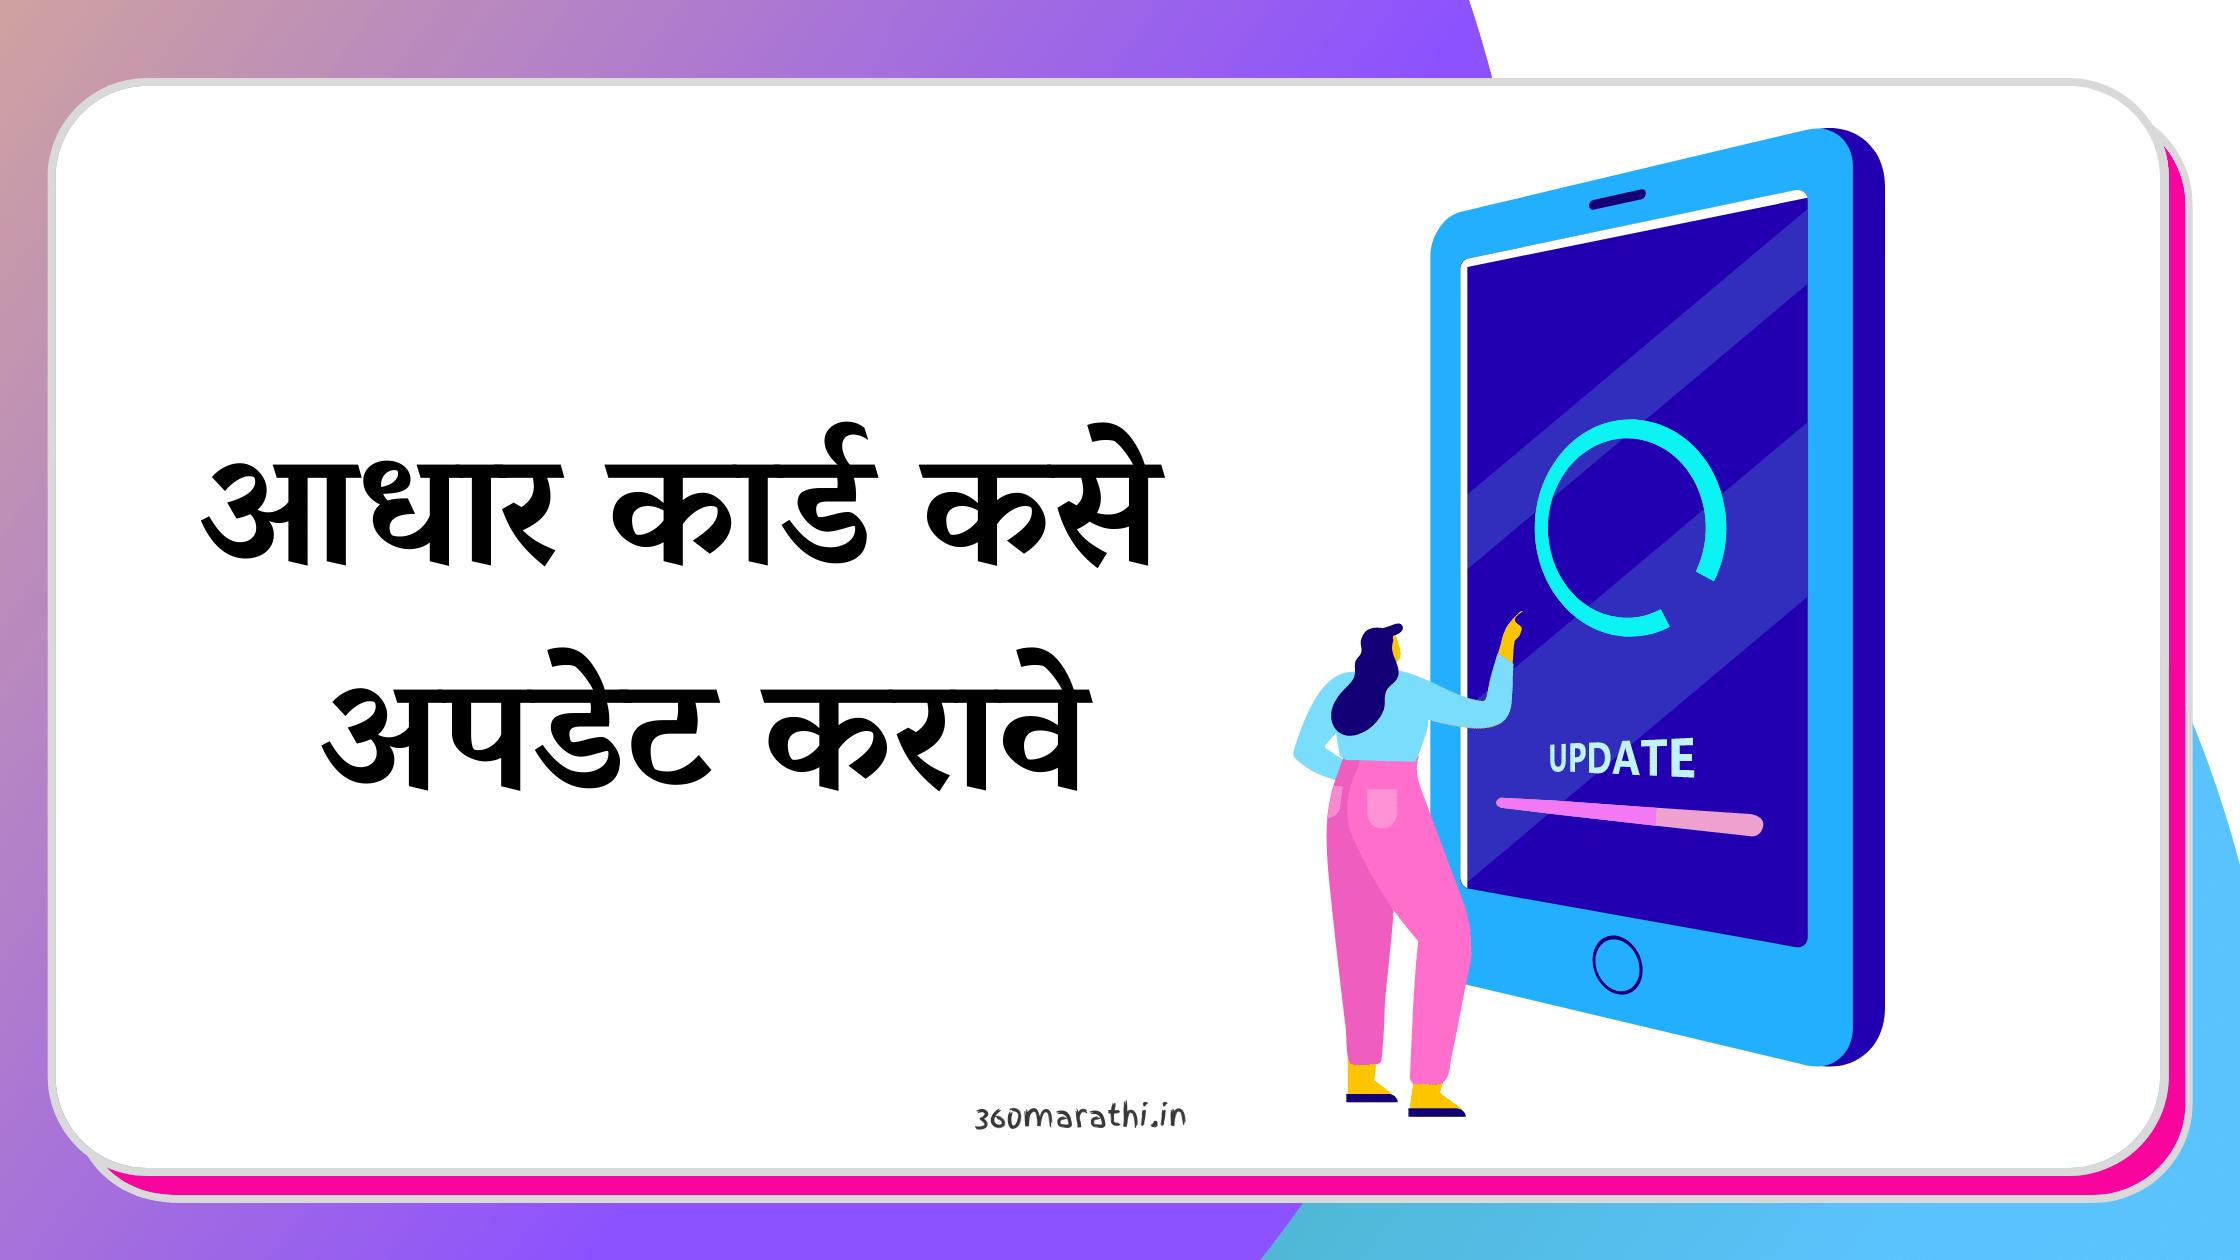 आधार कार्ड अपडेट कसे करावे | How to Update Aadhaar Card in Marathi